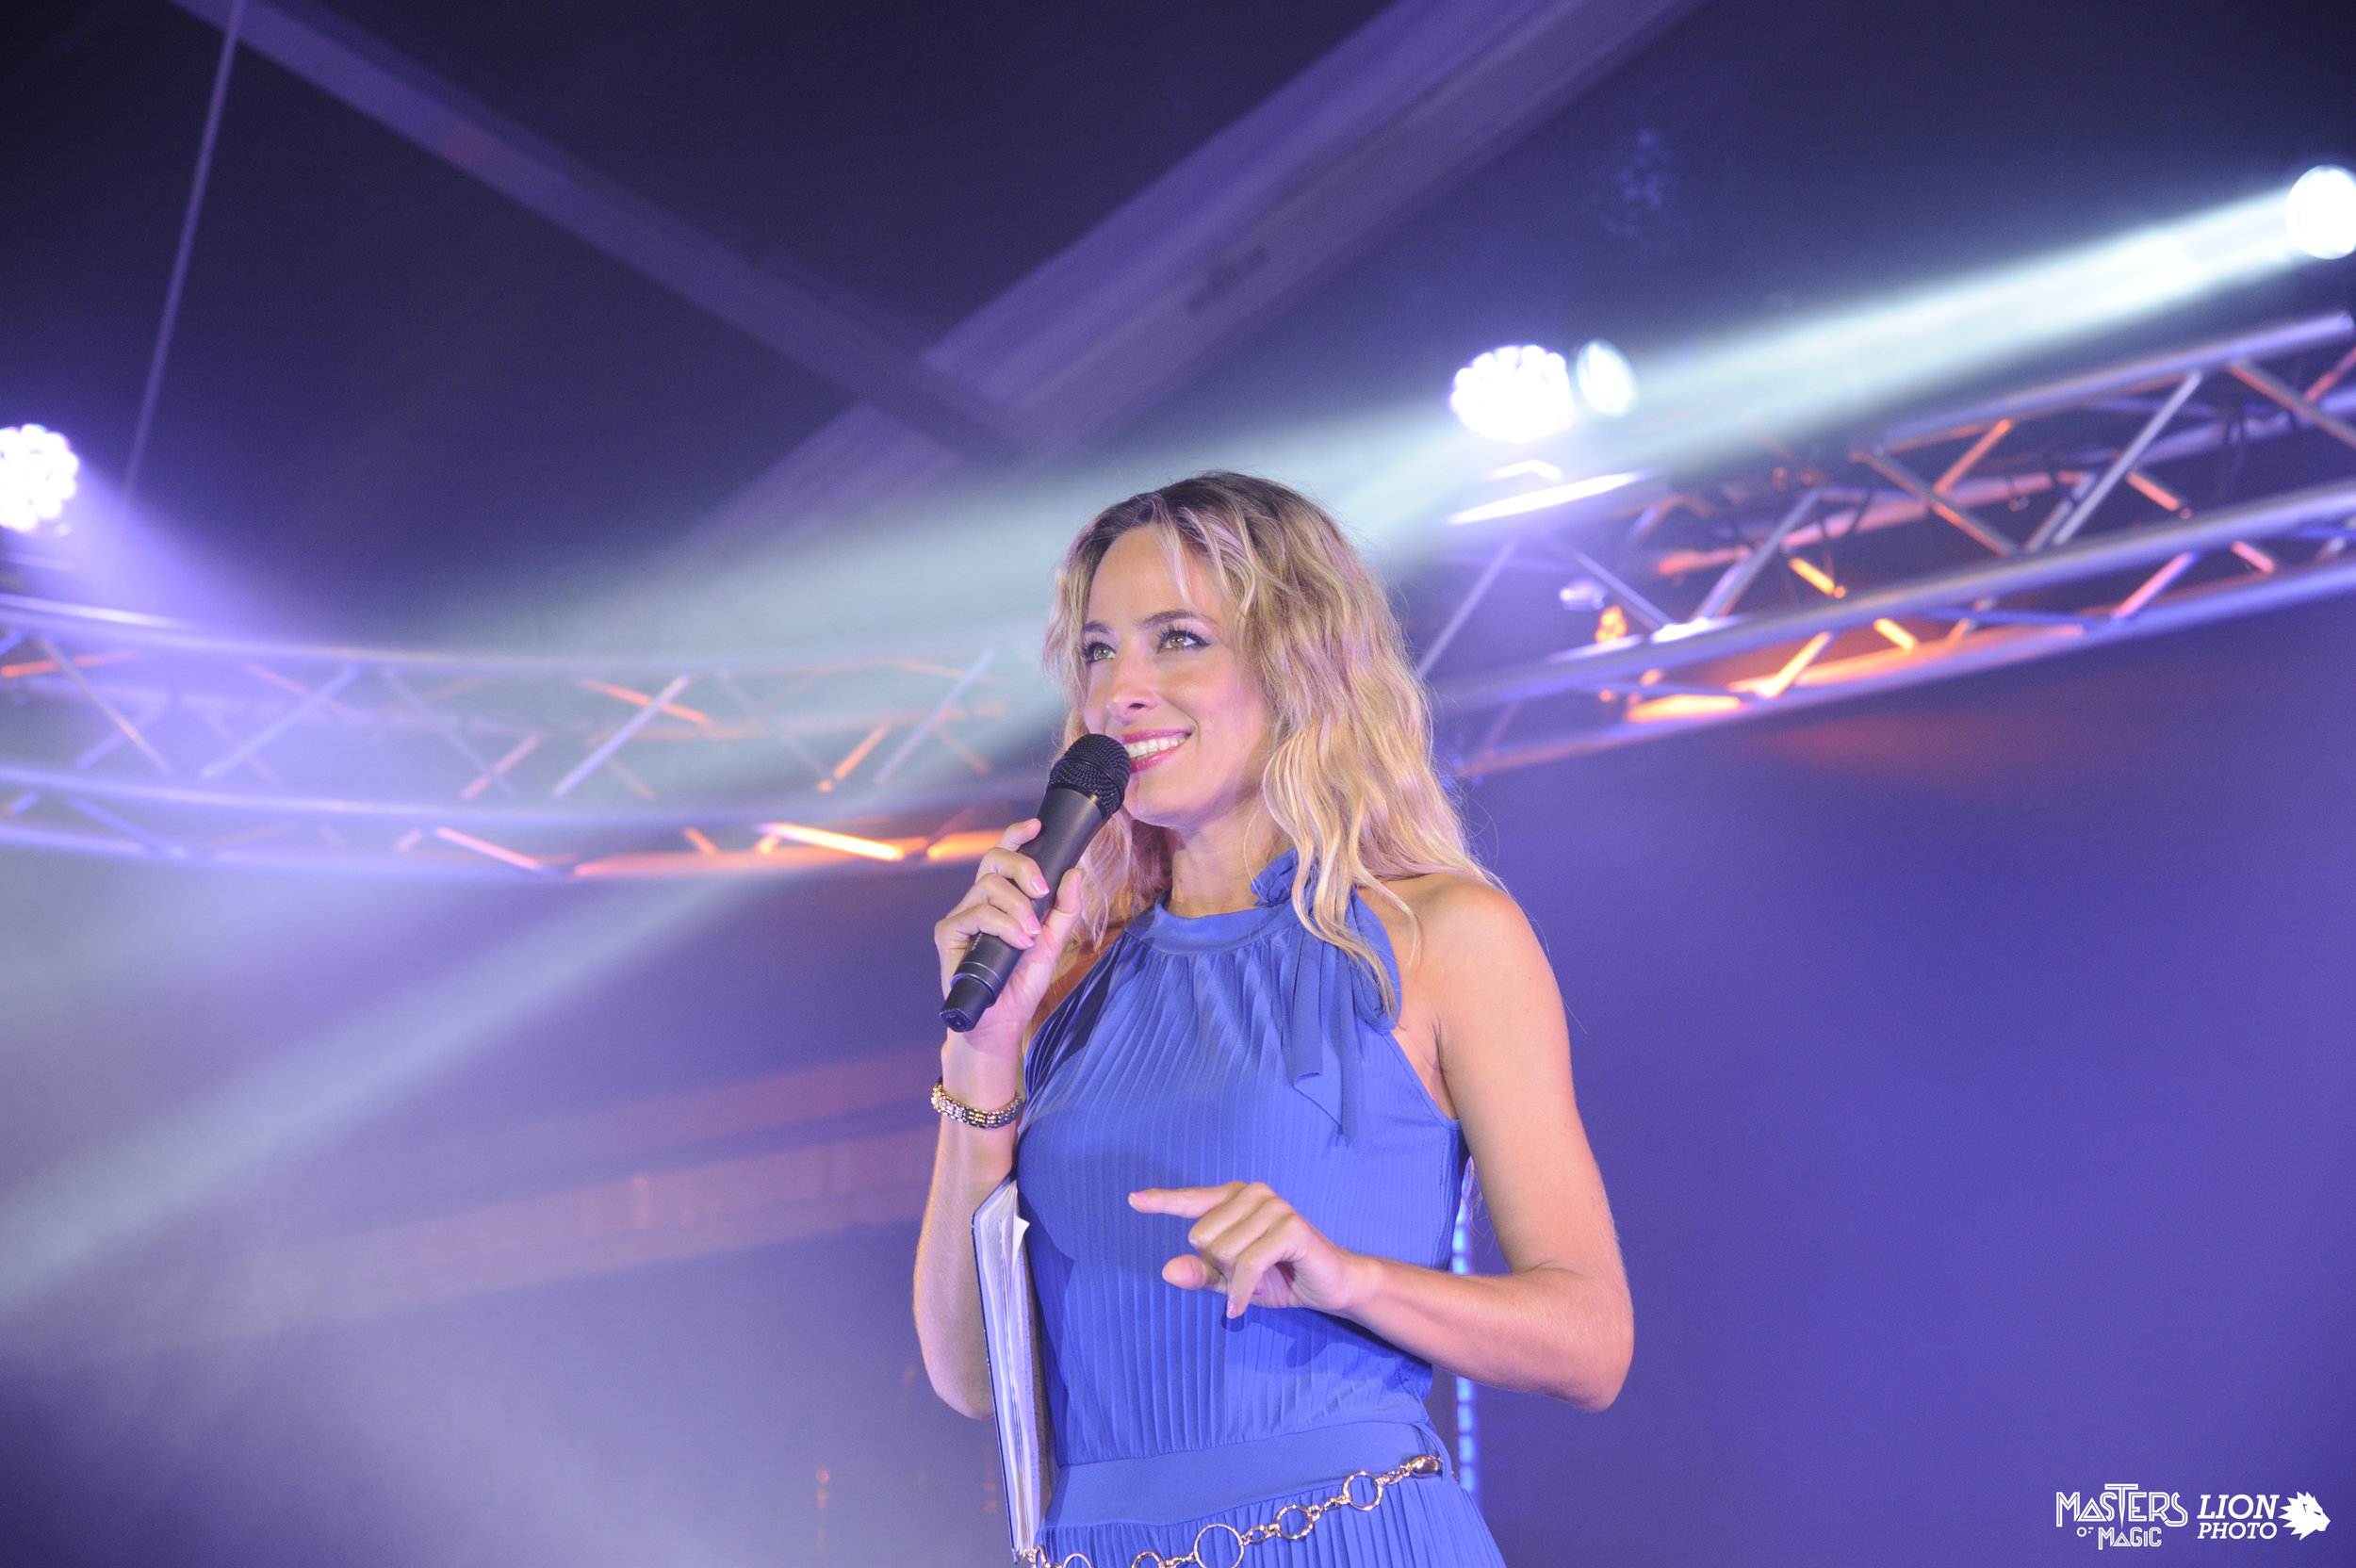 Jessica hosting a private corporate event